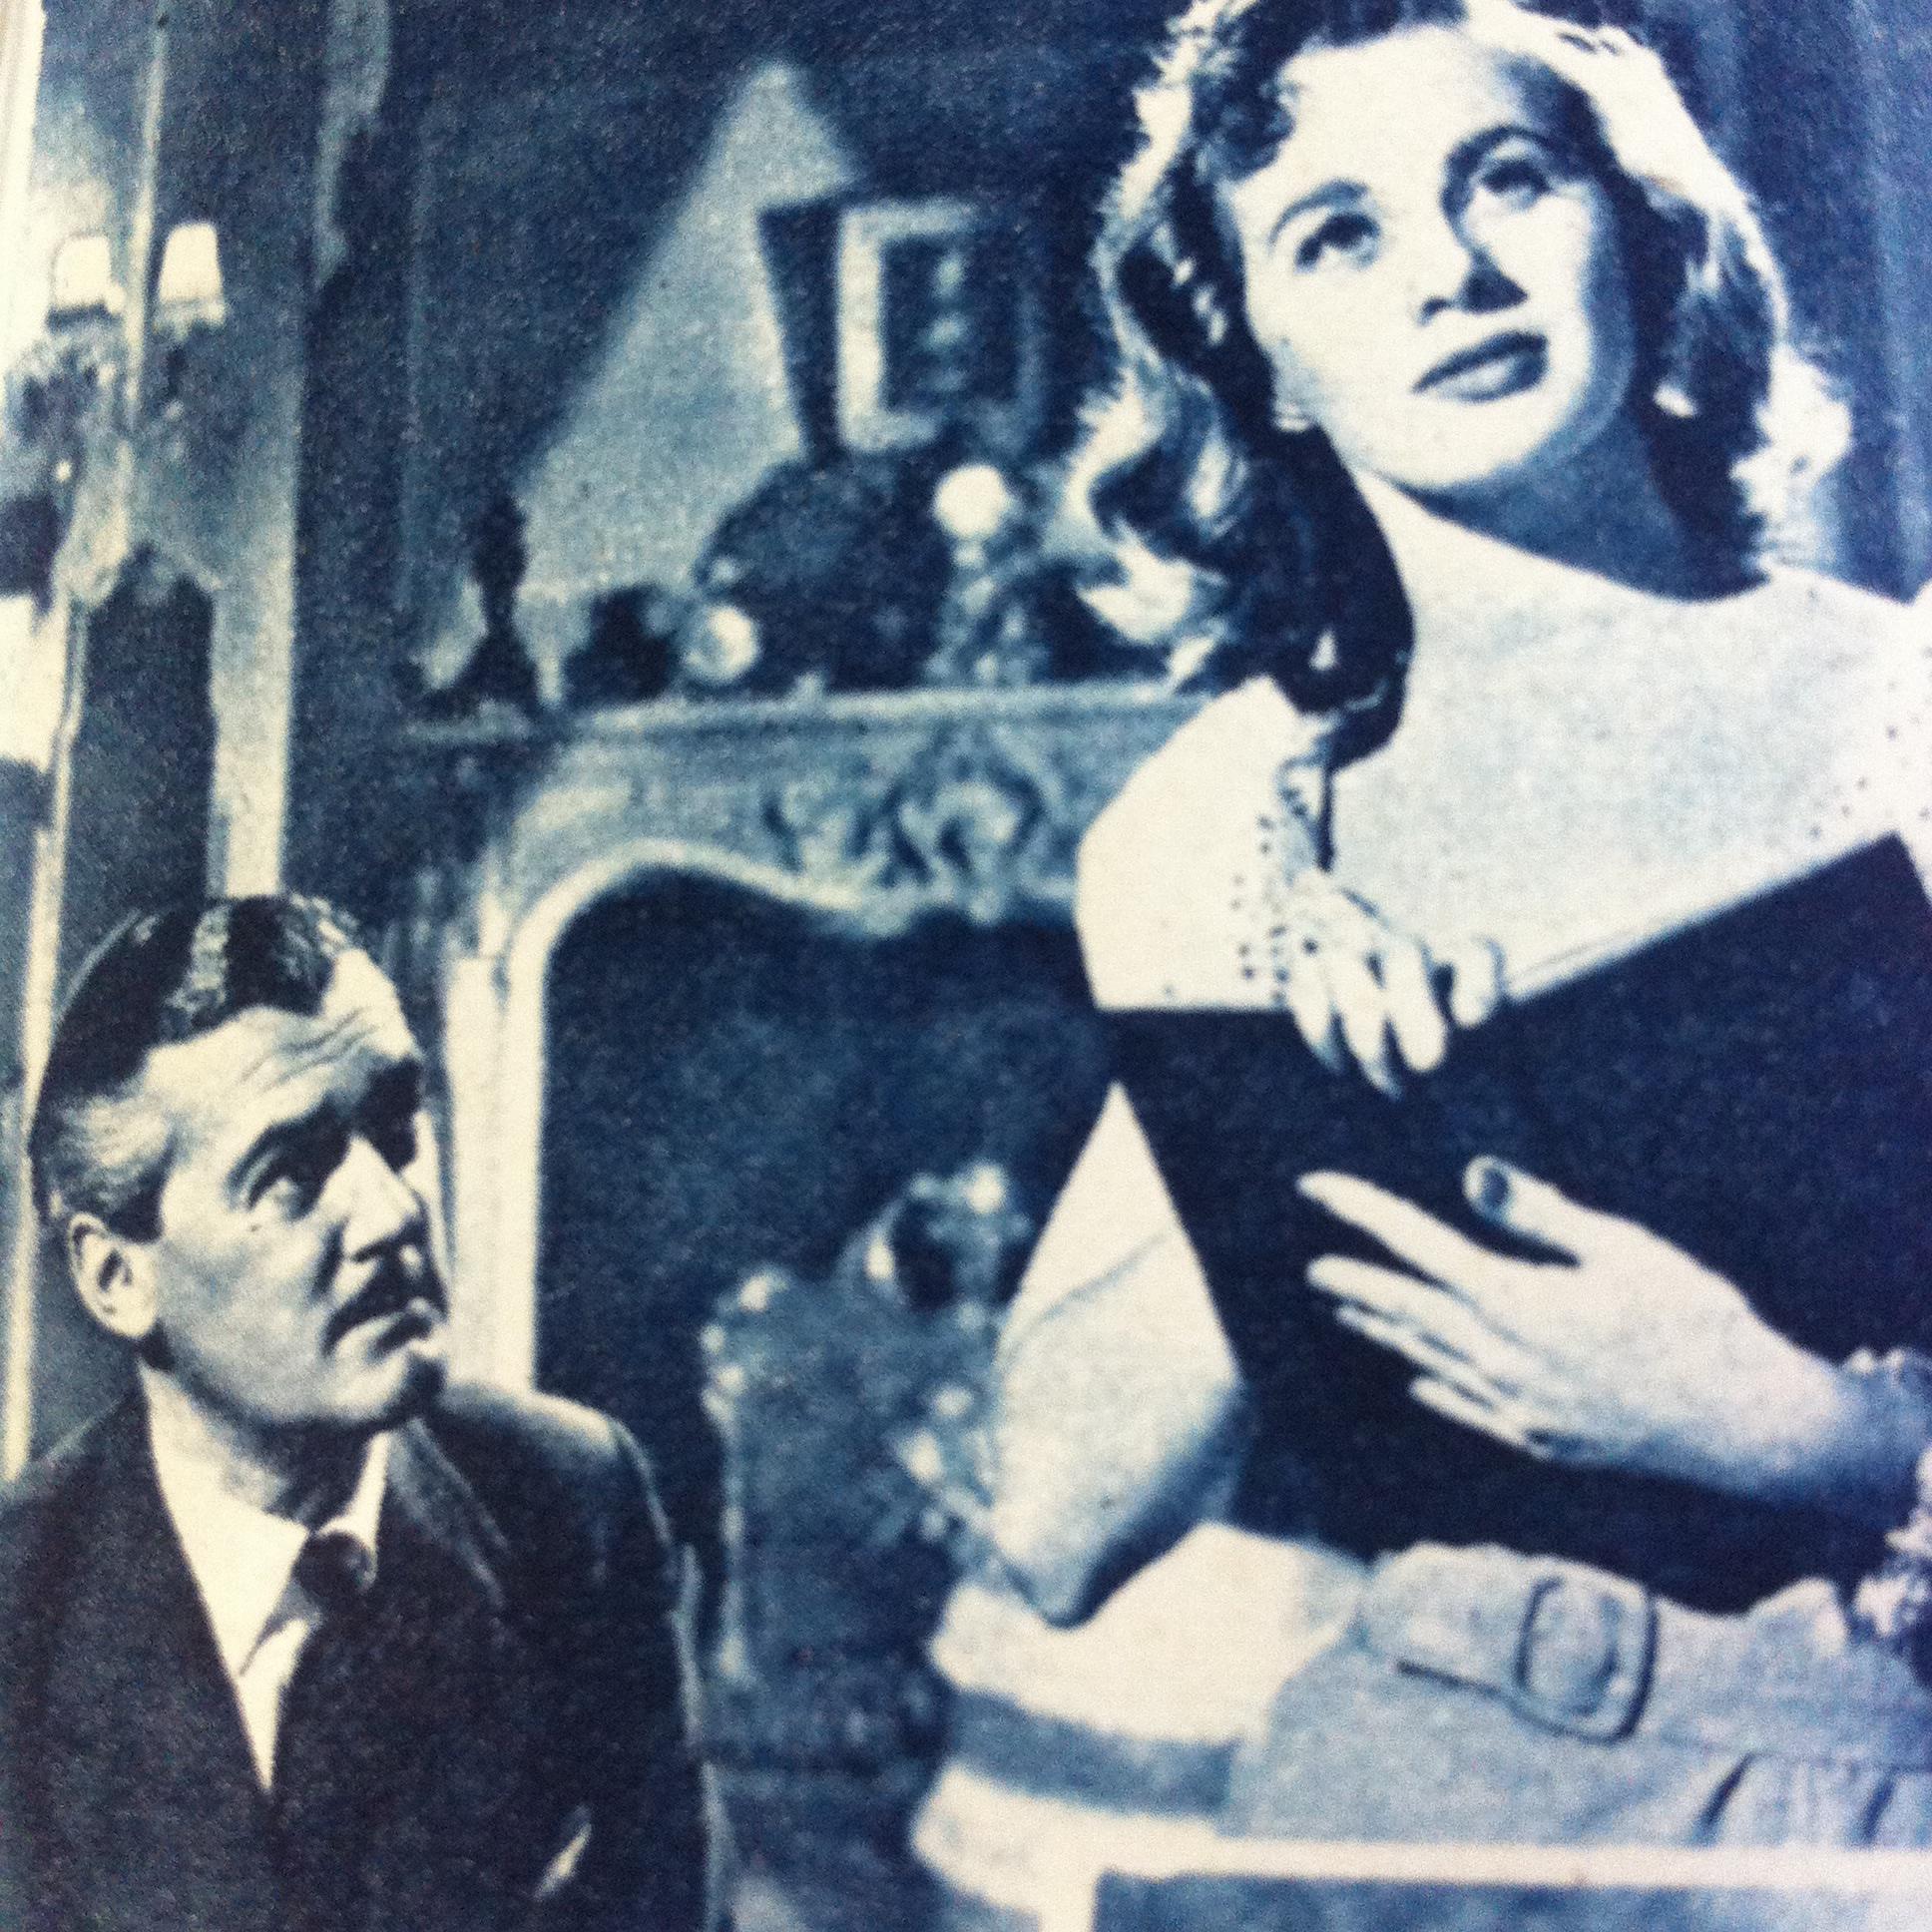 Hugh Williams and Mai Zetterling in The Romantic Age (1949)